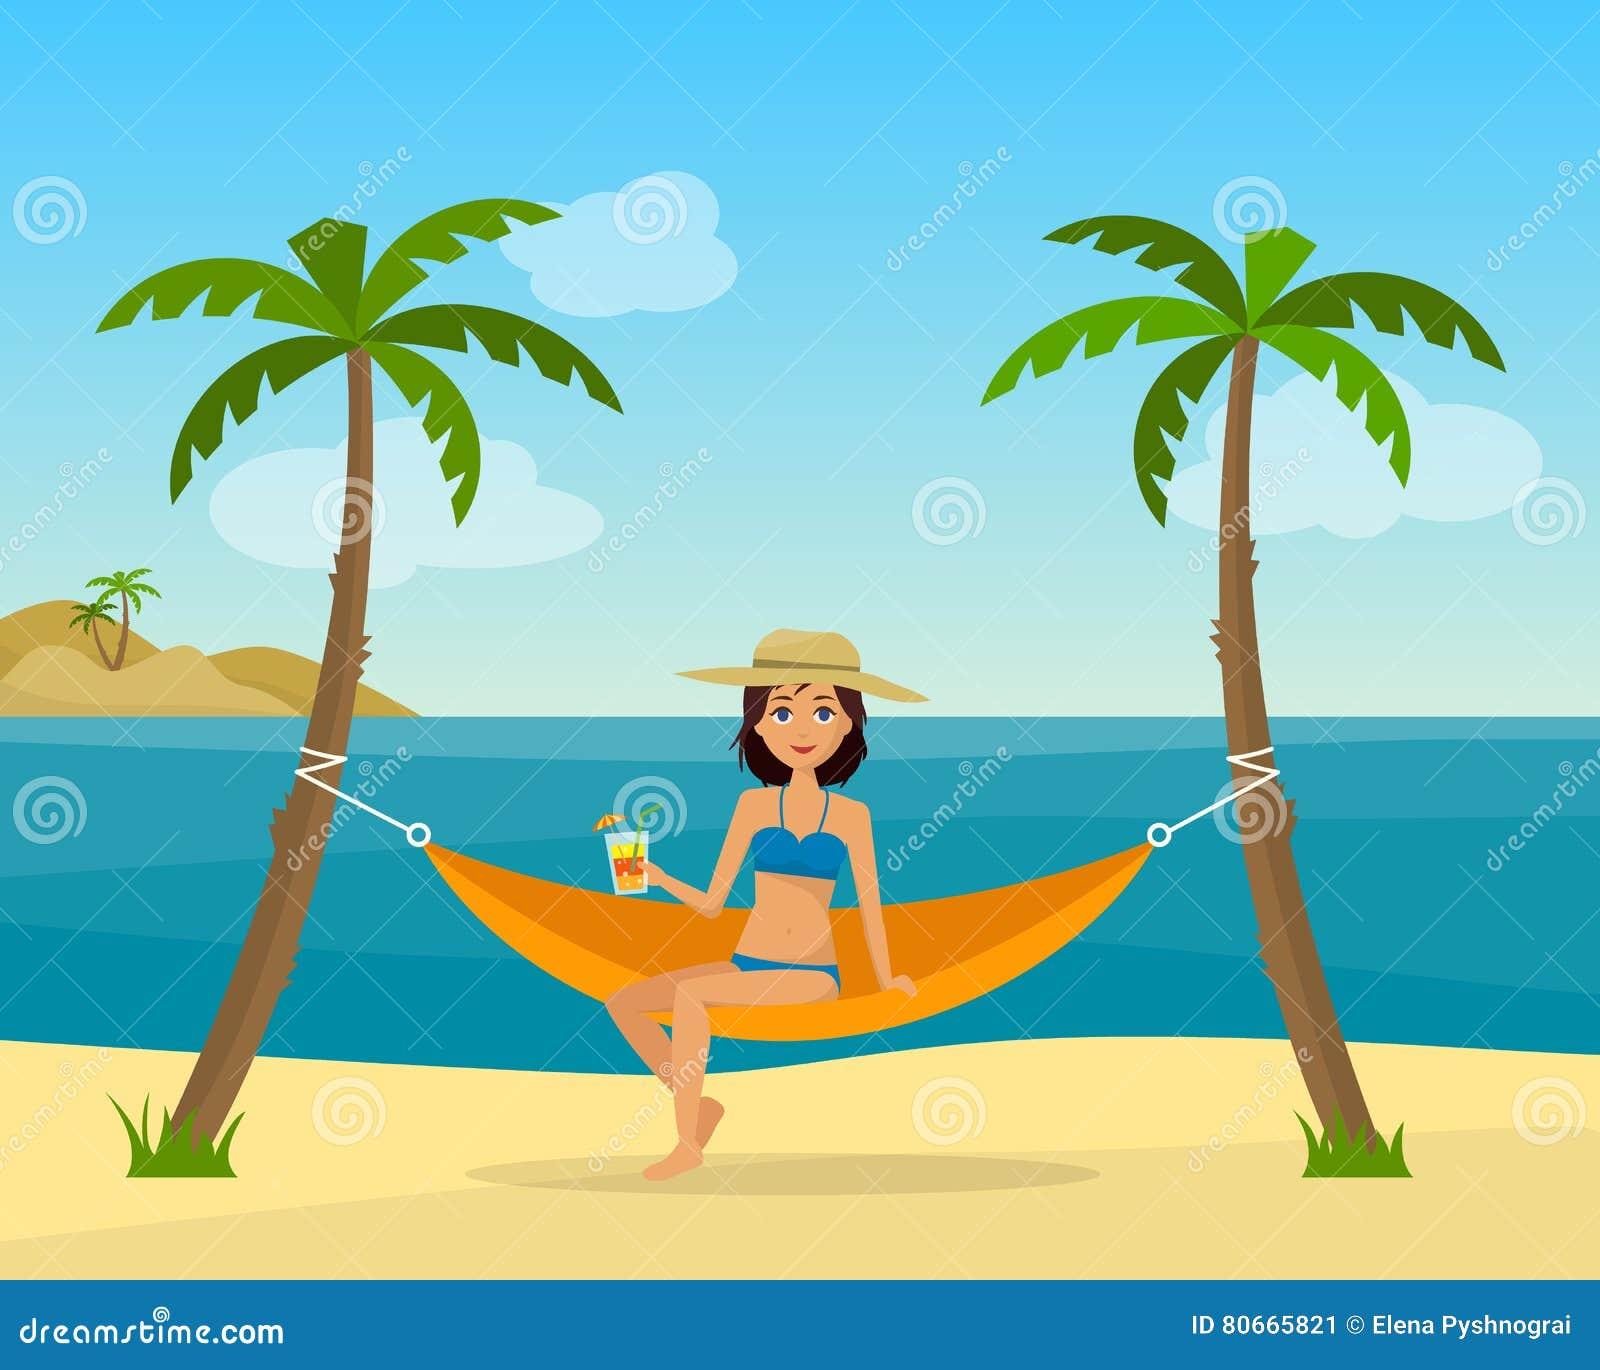 11 >> Girl In Swimsuit In Hammock With Palm Stock Vector - Illustration of bikini, beauty: 80665821